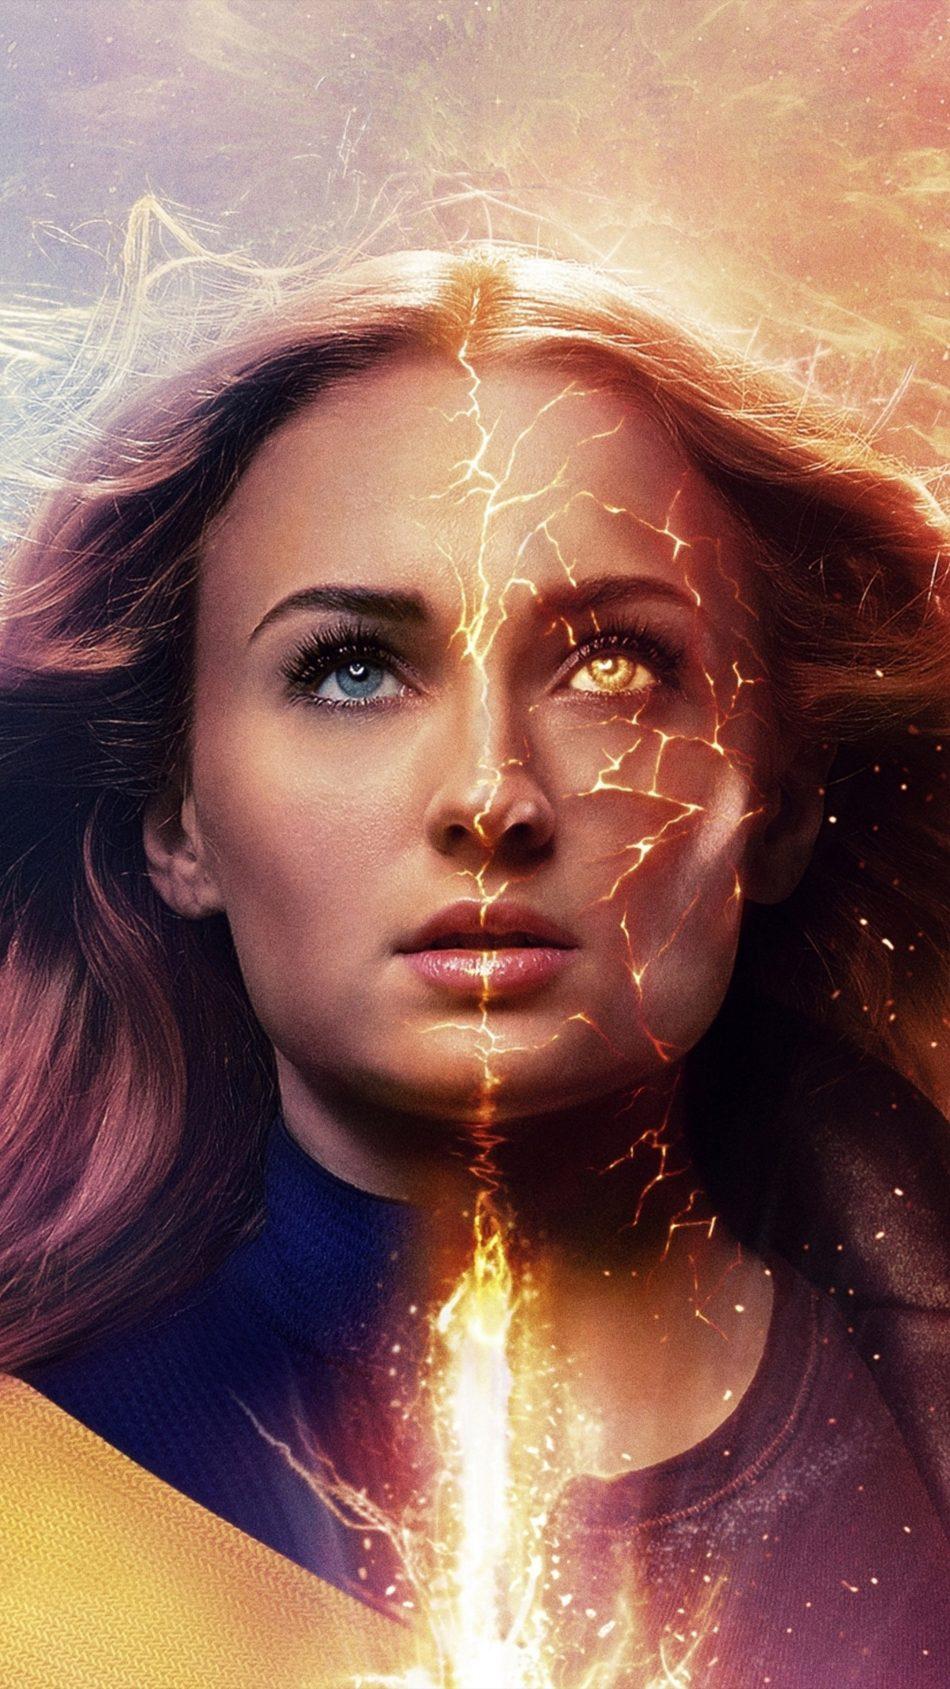 Sophie Turner As Jean Grey In X Men Dark Phoenix 4k Ultra Hd Mobile Wallpaper